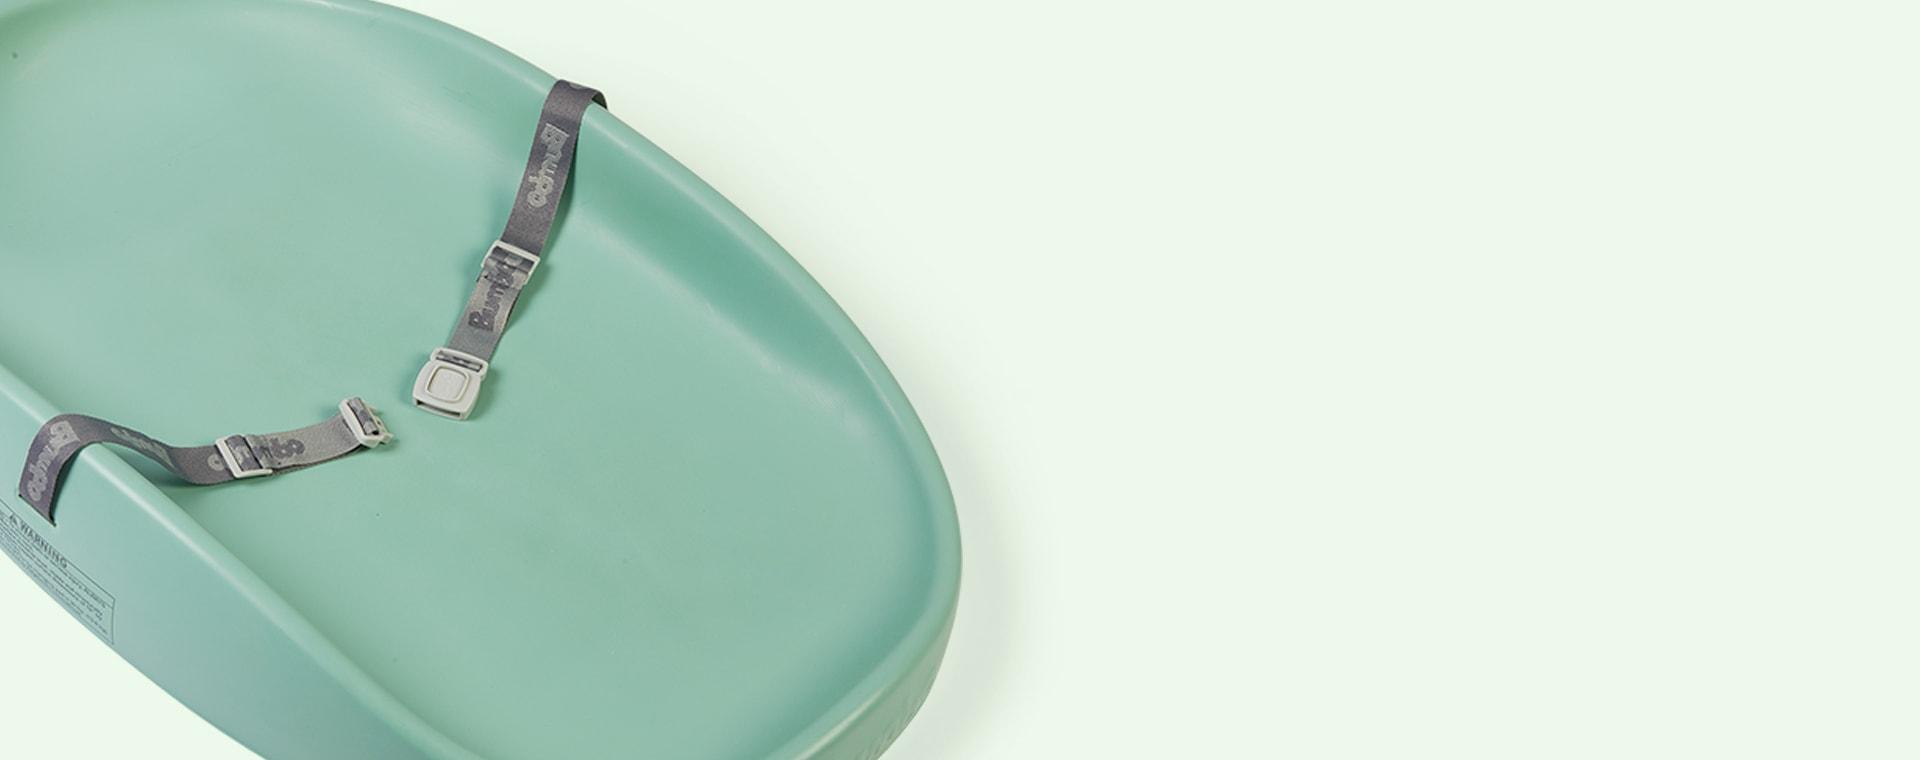 Hemlock Green Bumbo Changing Pad